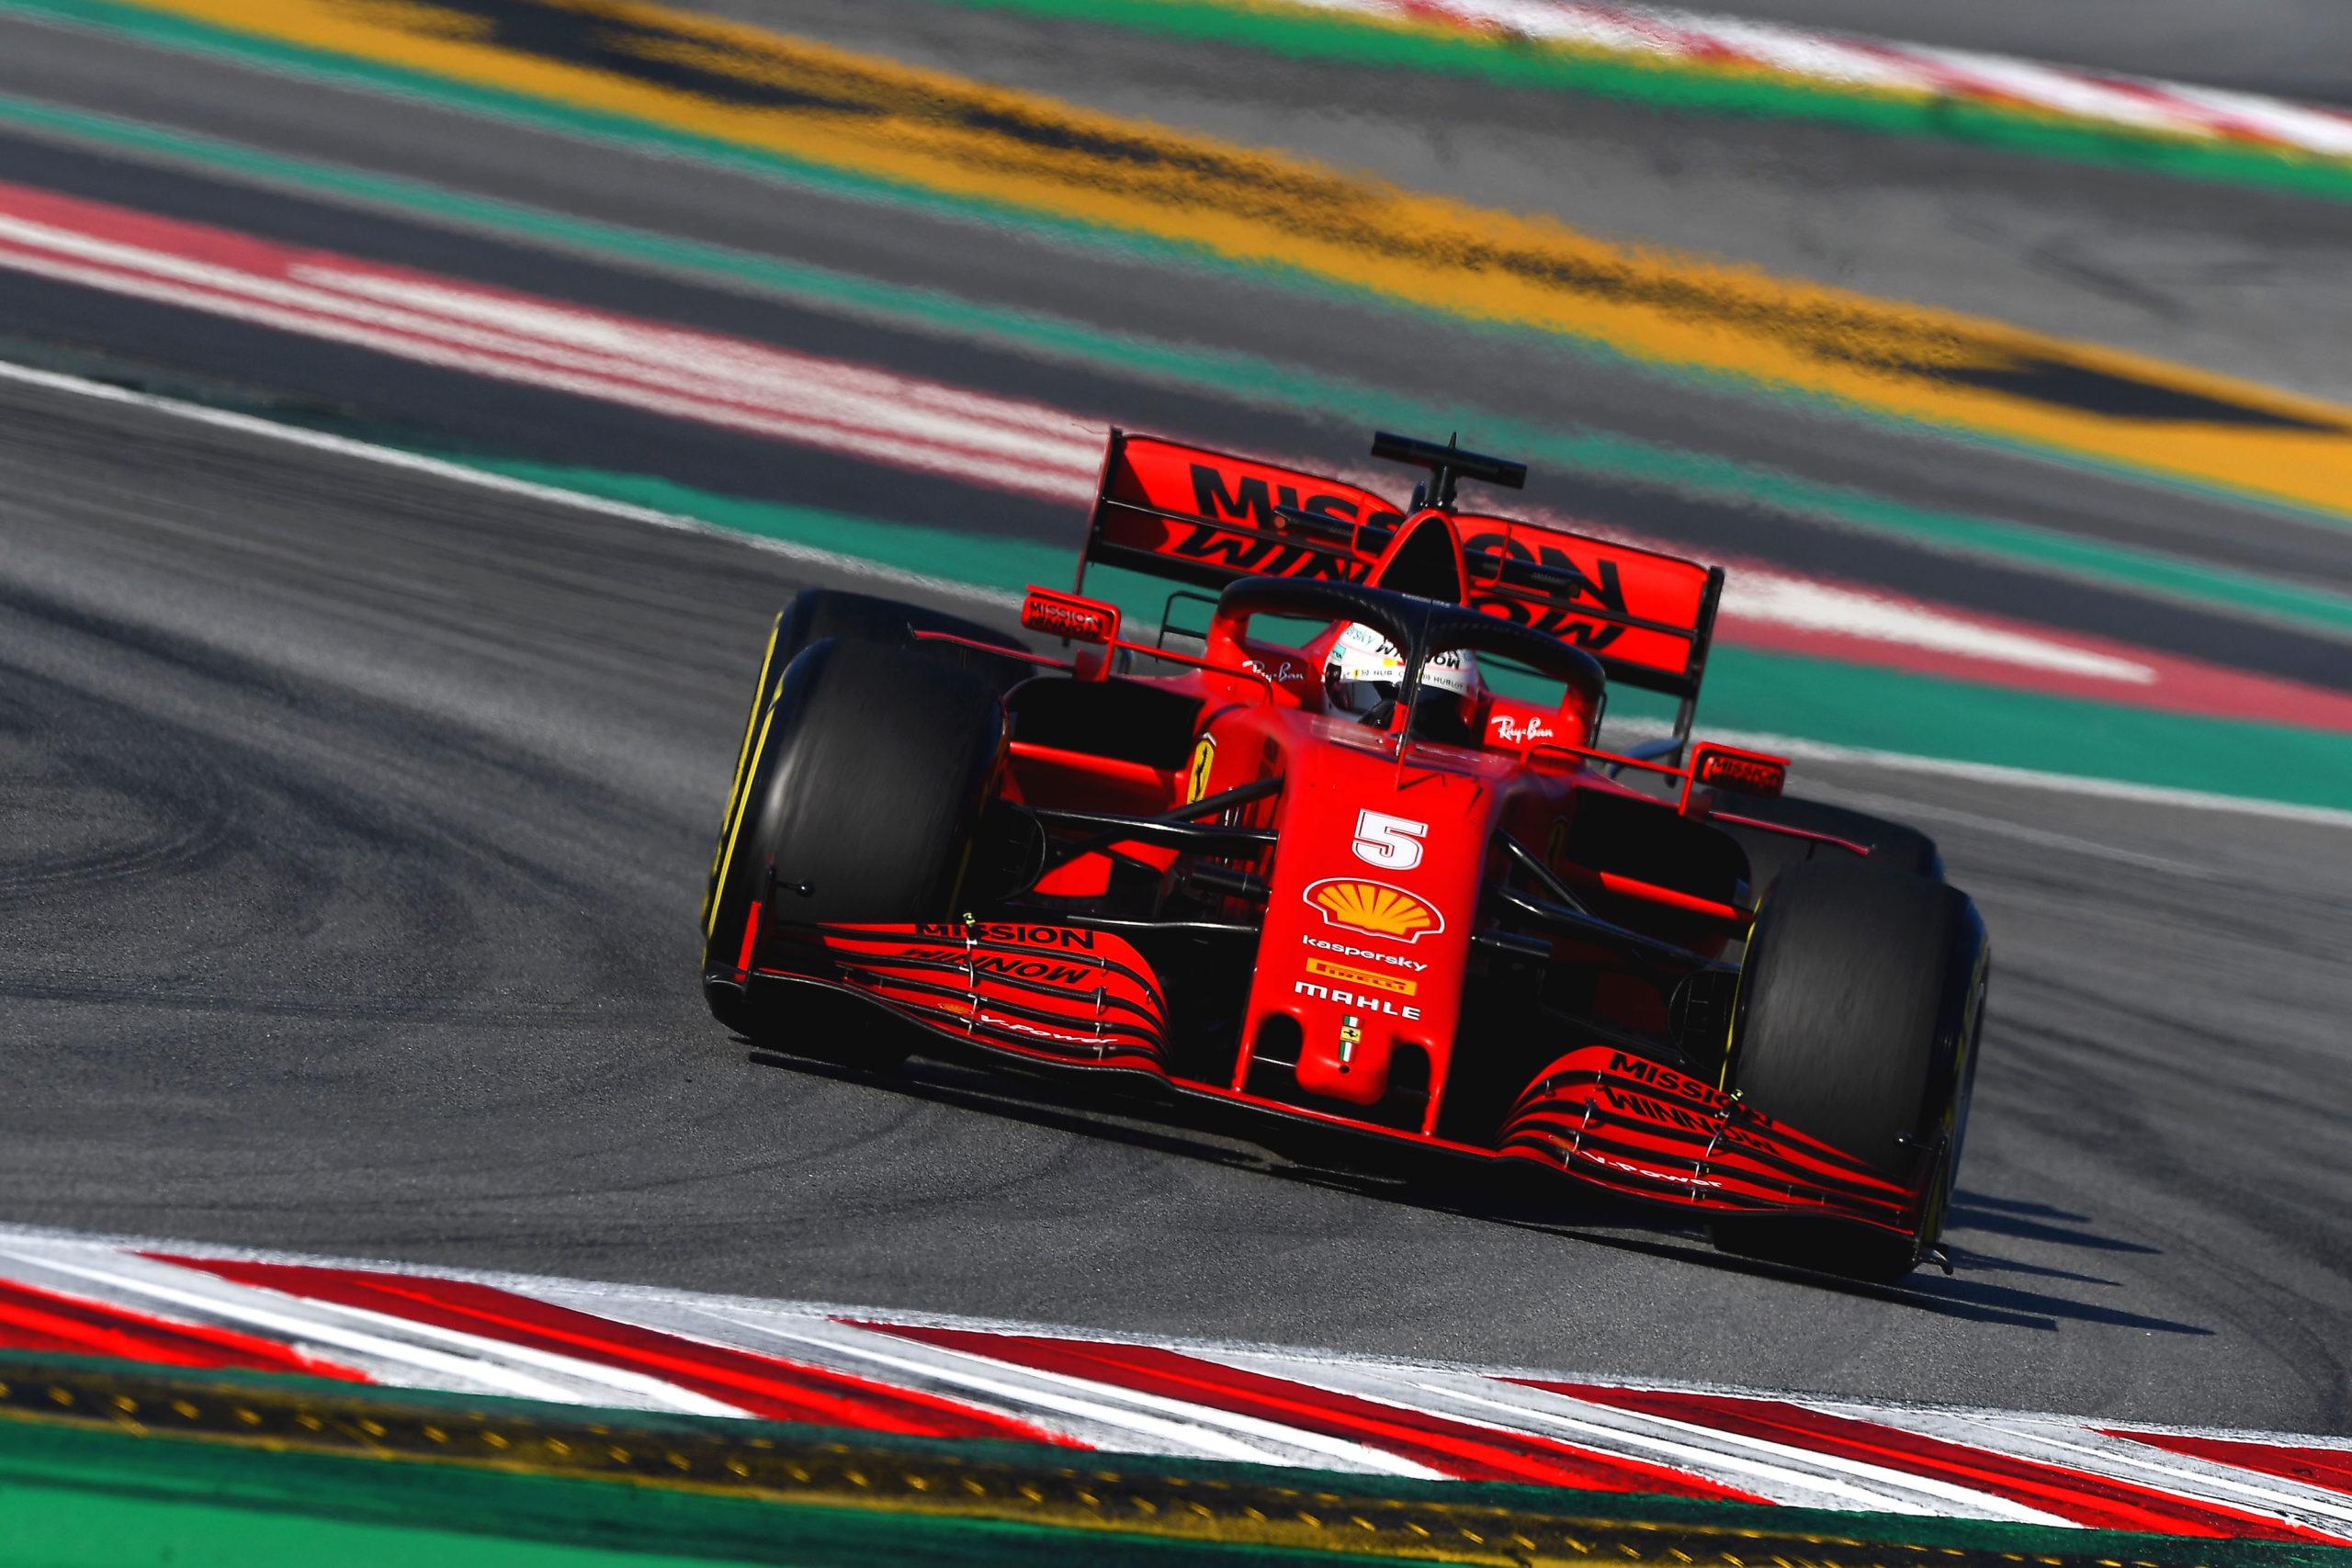 Ferrari nunca intento renovar a Vettel | Deportes | Noticias